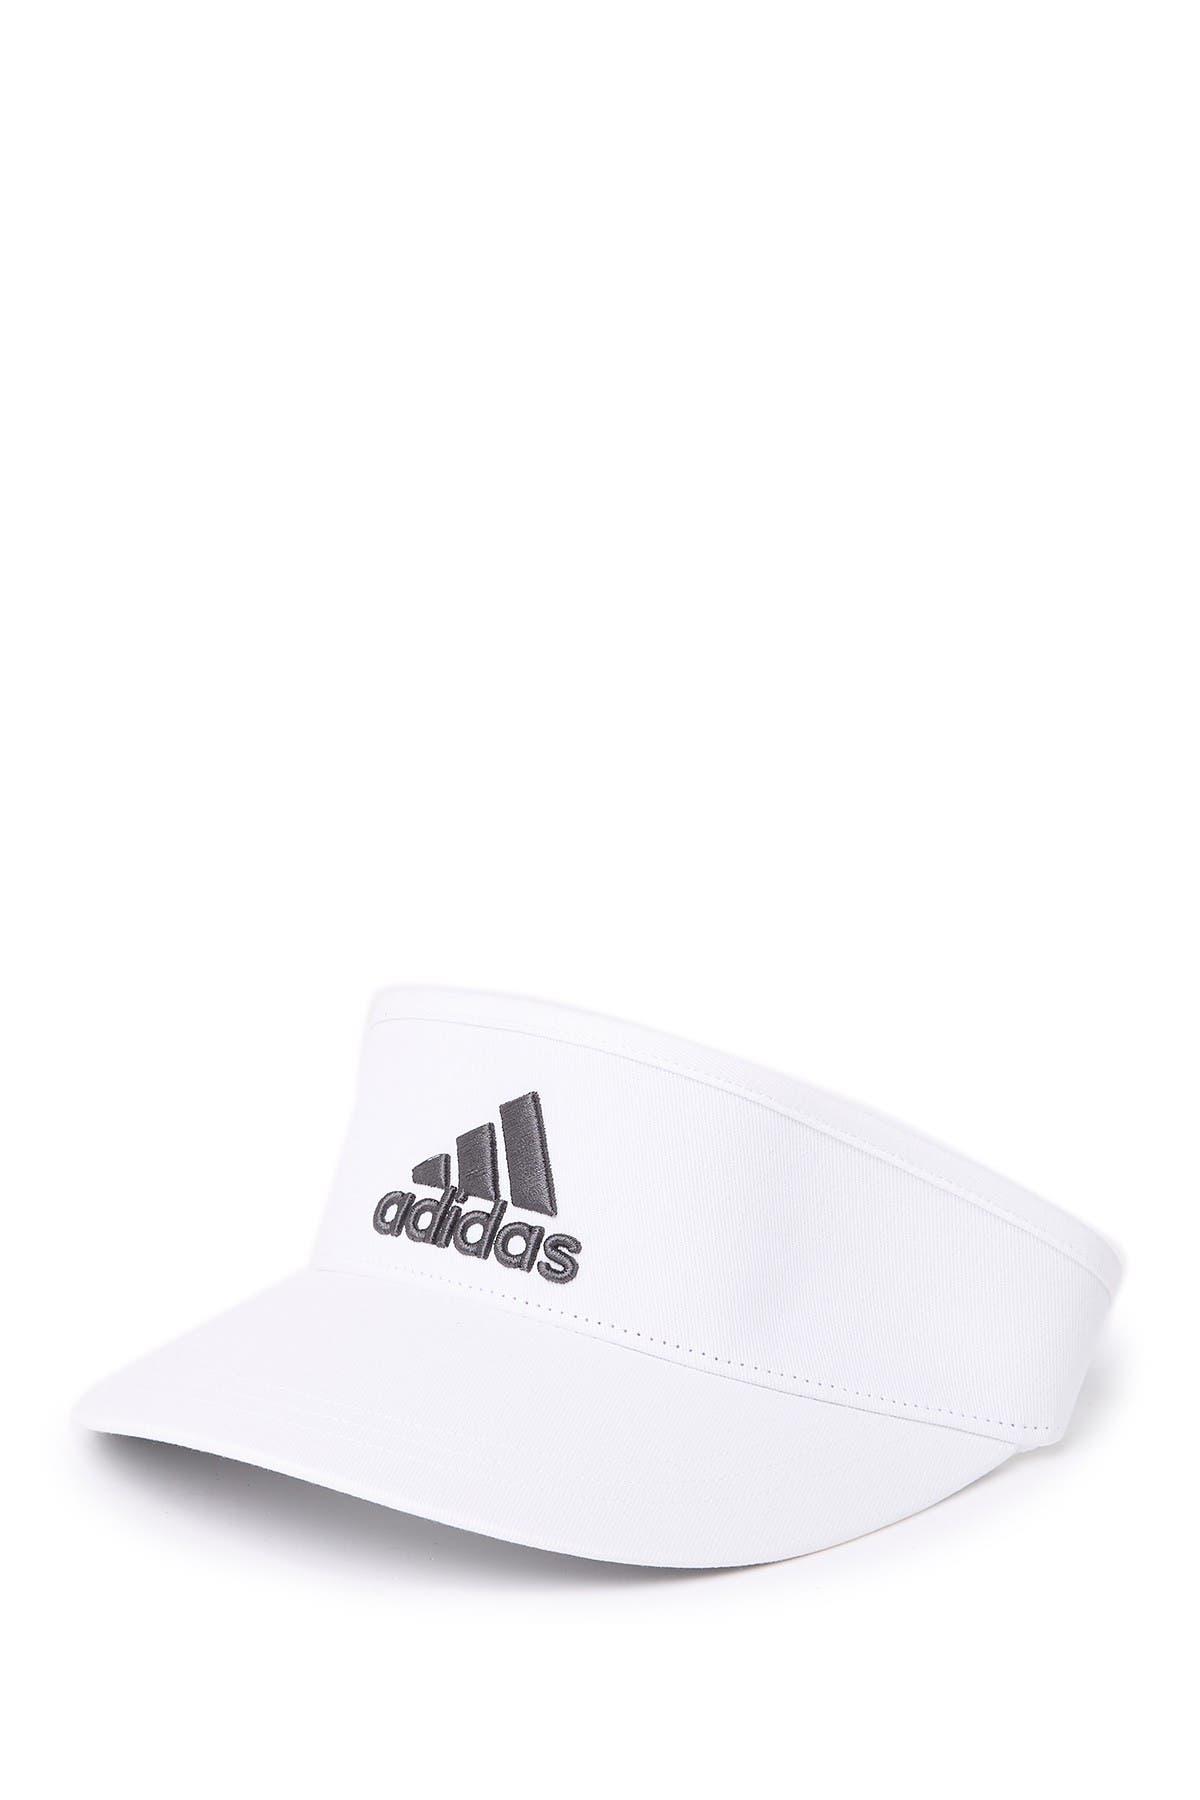 Image of Adidas Golf Golf High-Crown Visor